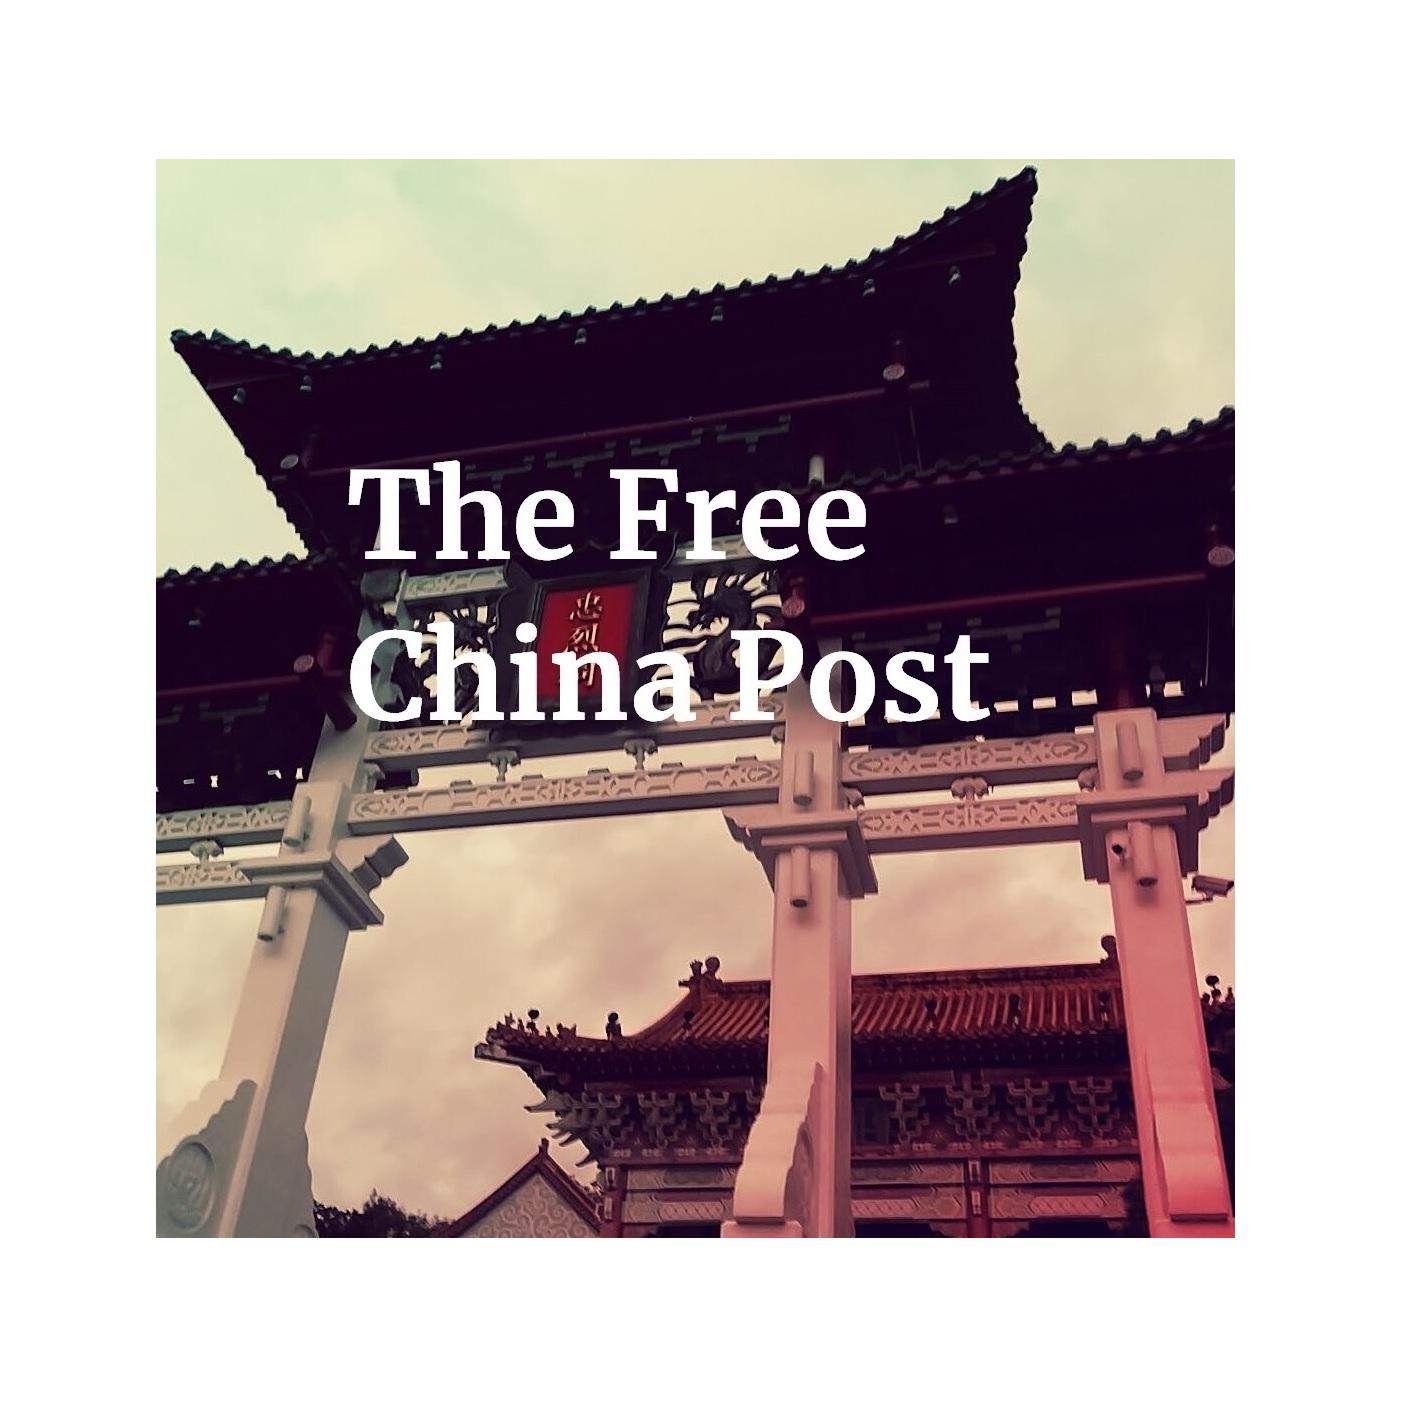 The Free China Pod